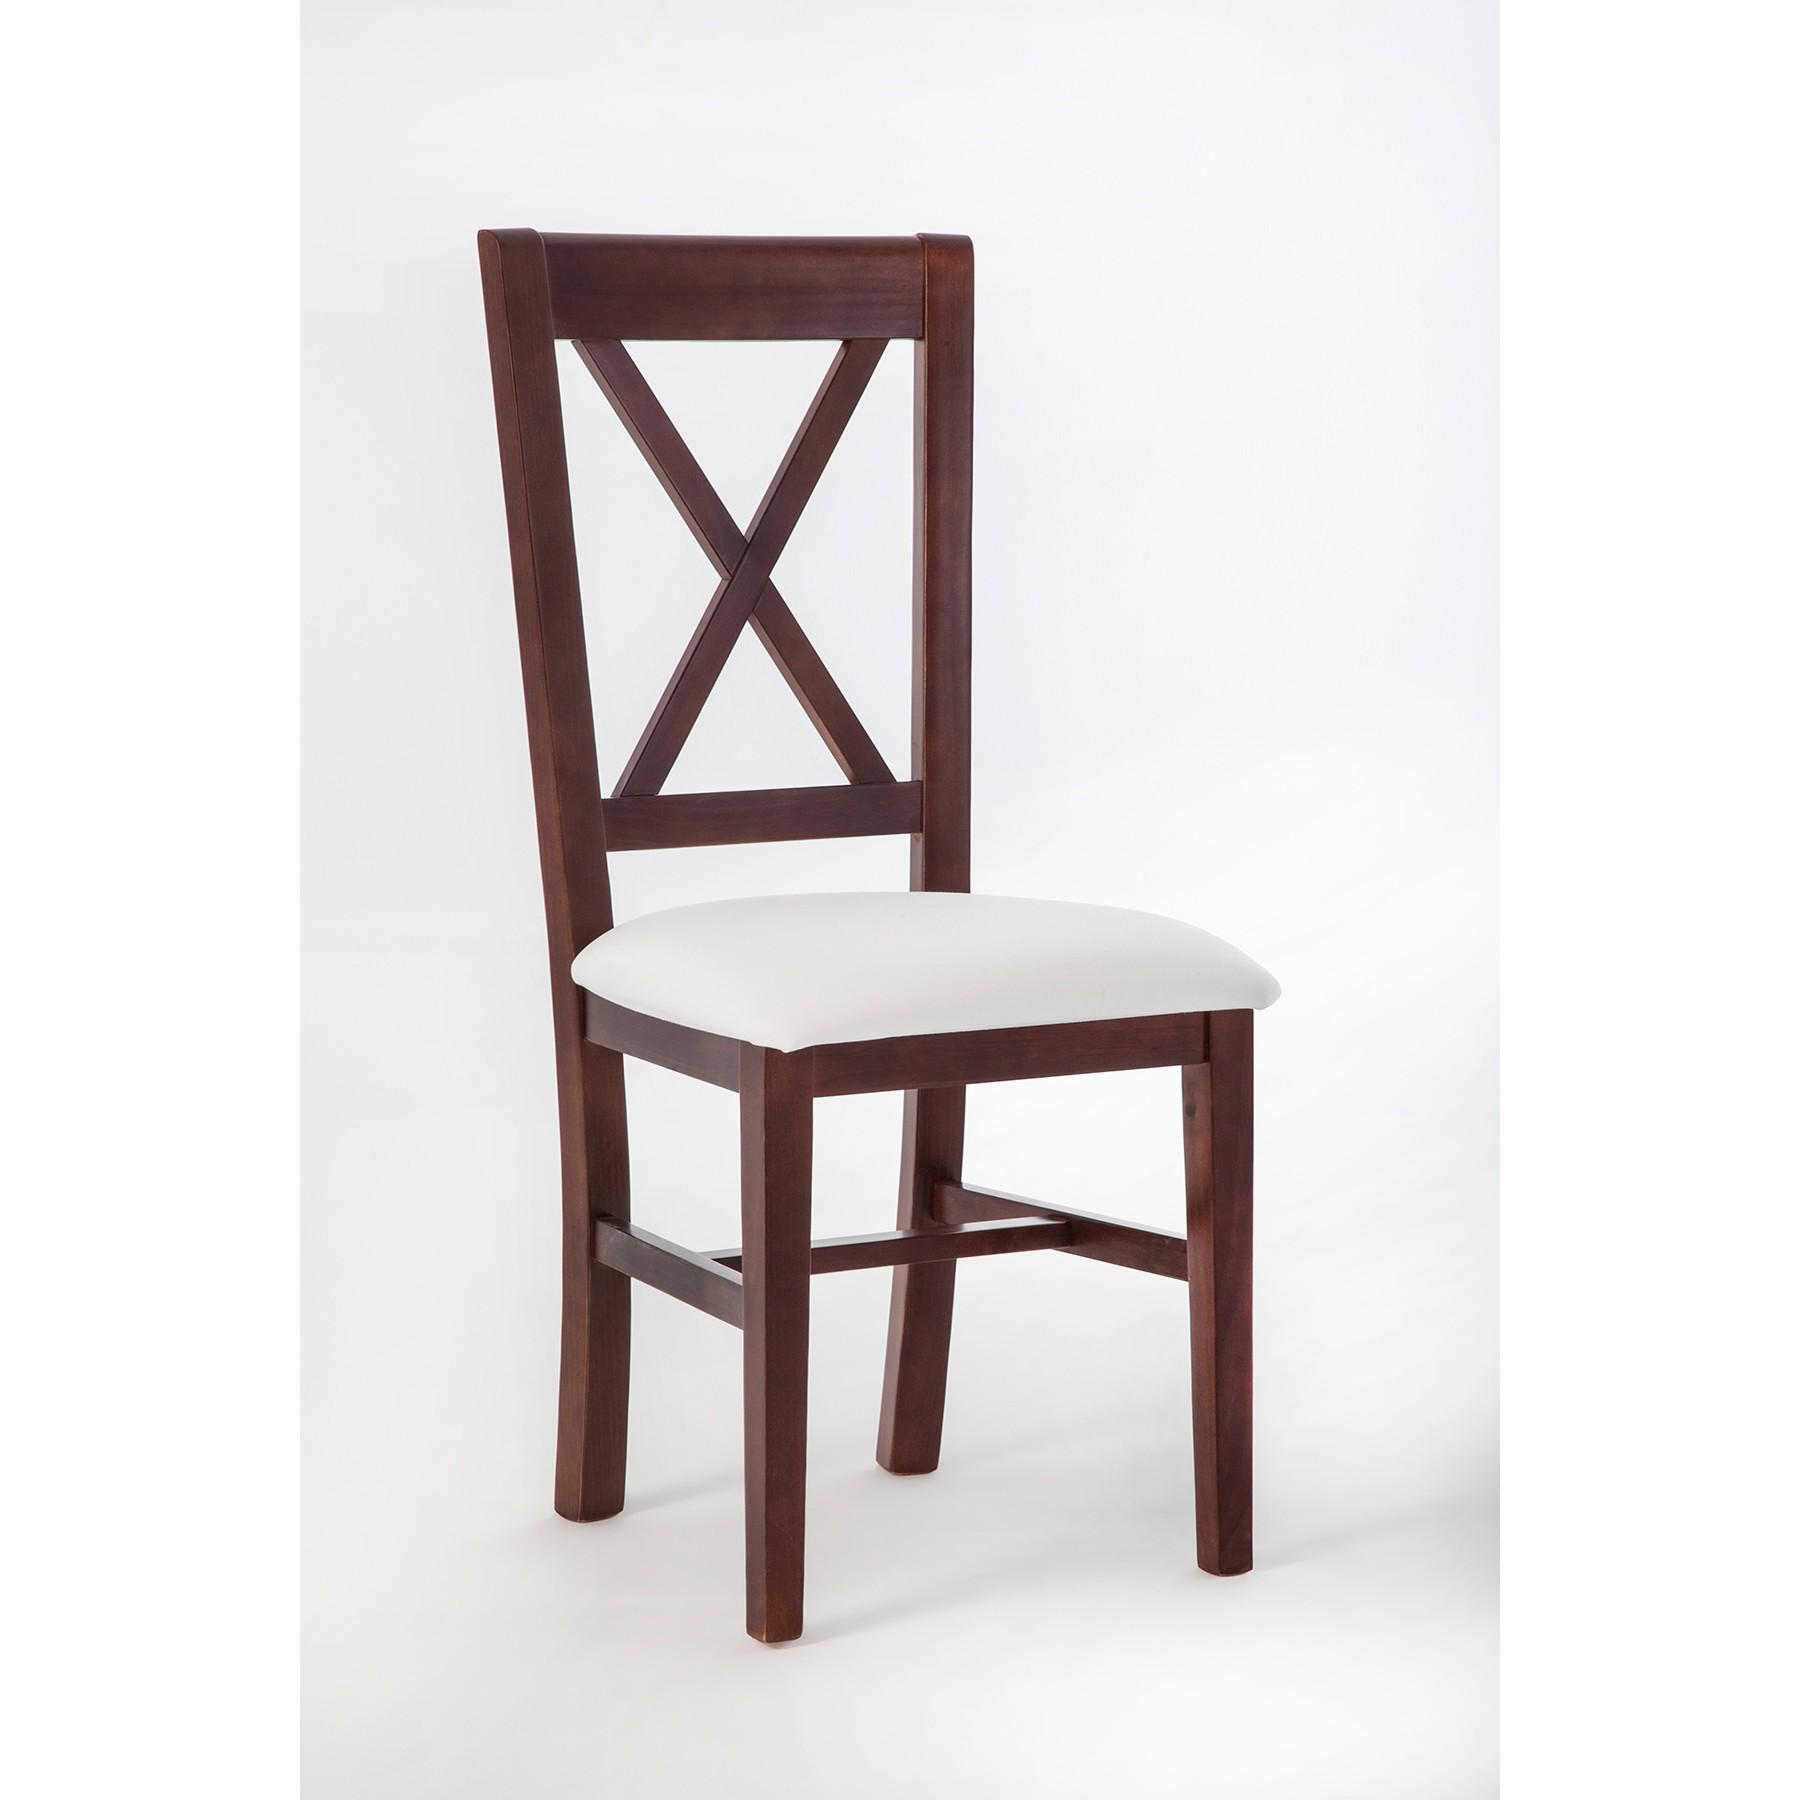 Modelos de sillas de comedor modernas amazing sillas for Modelos sillas comedor